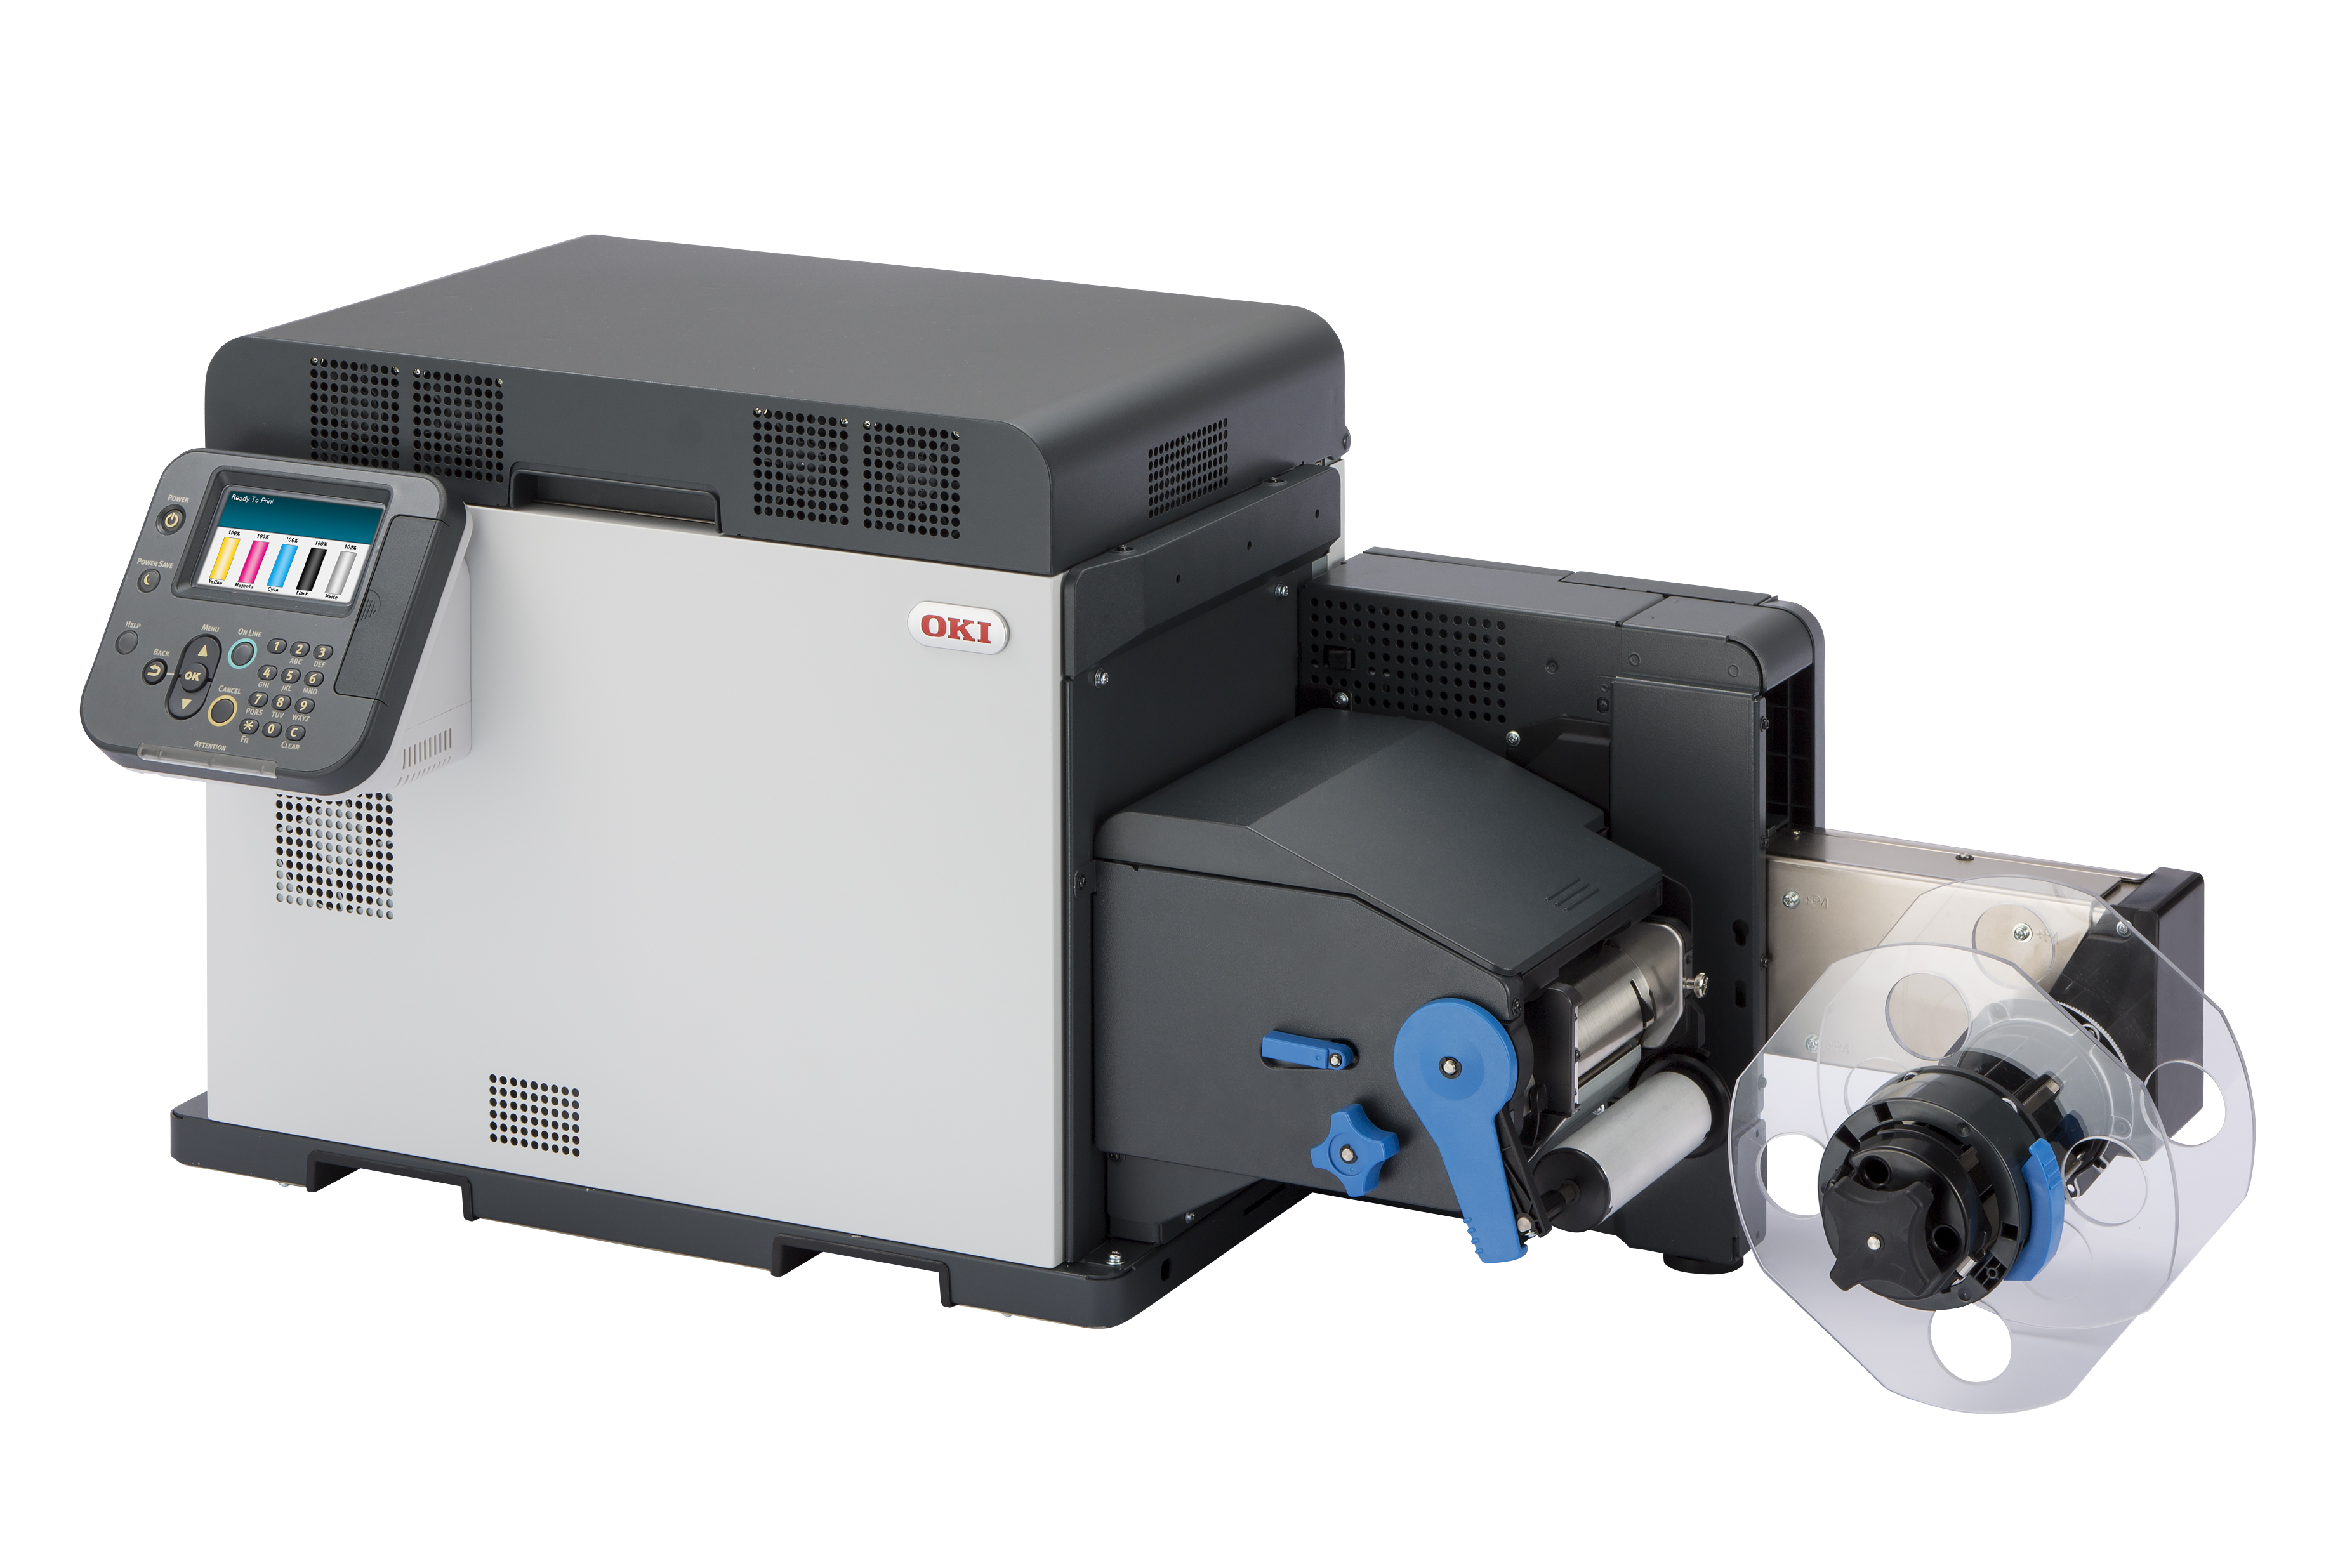 oki pro1040 label printer